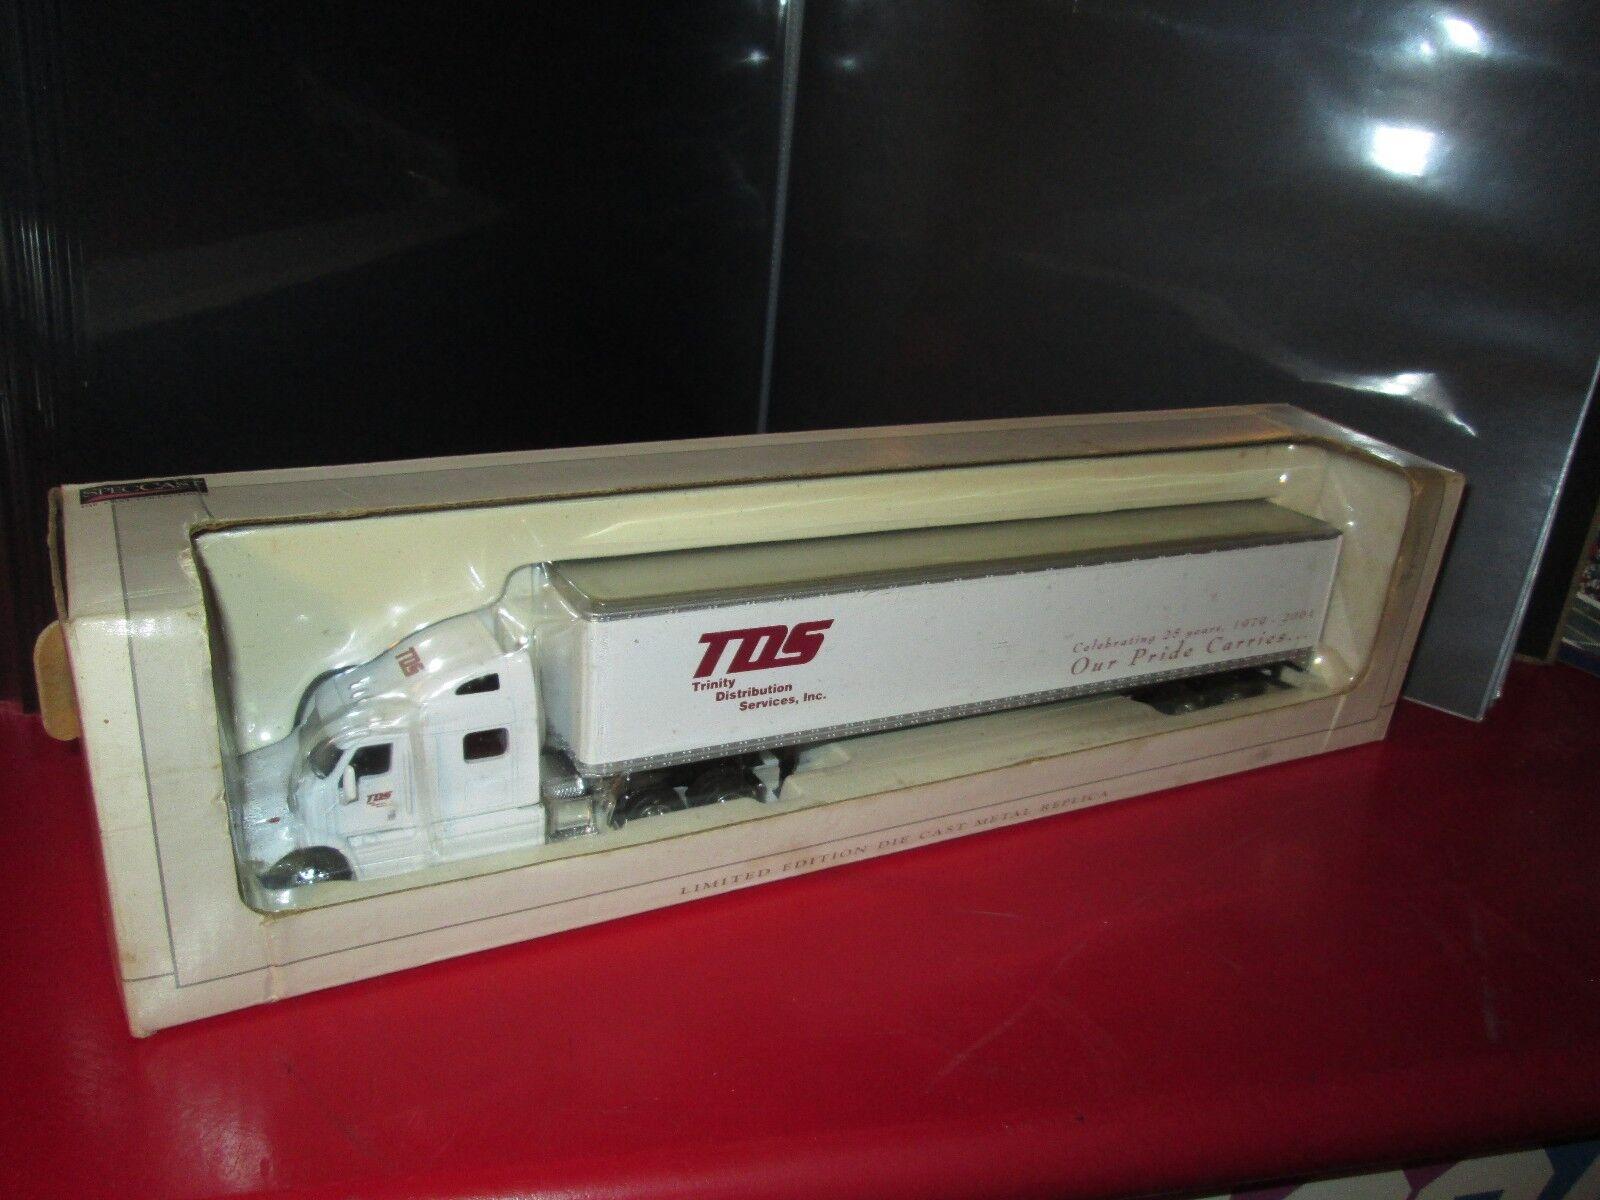 Trinty distribution serv semi tractor peterbilt 387  speccast Van Trailer 1 64